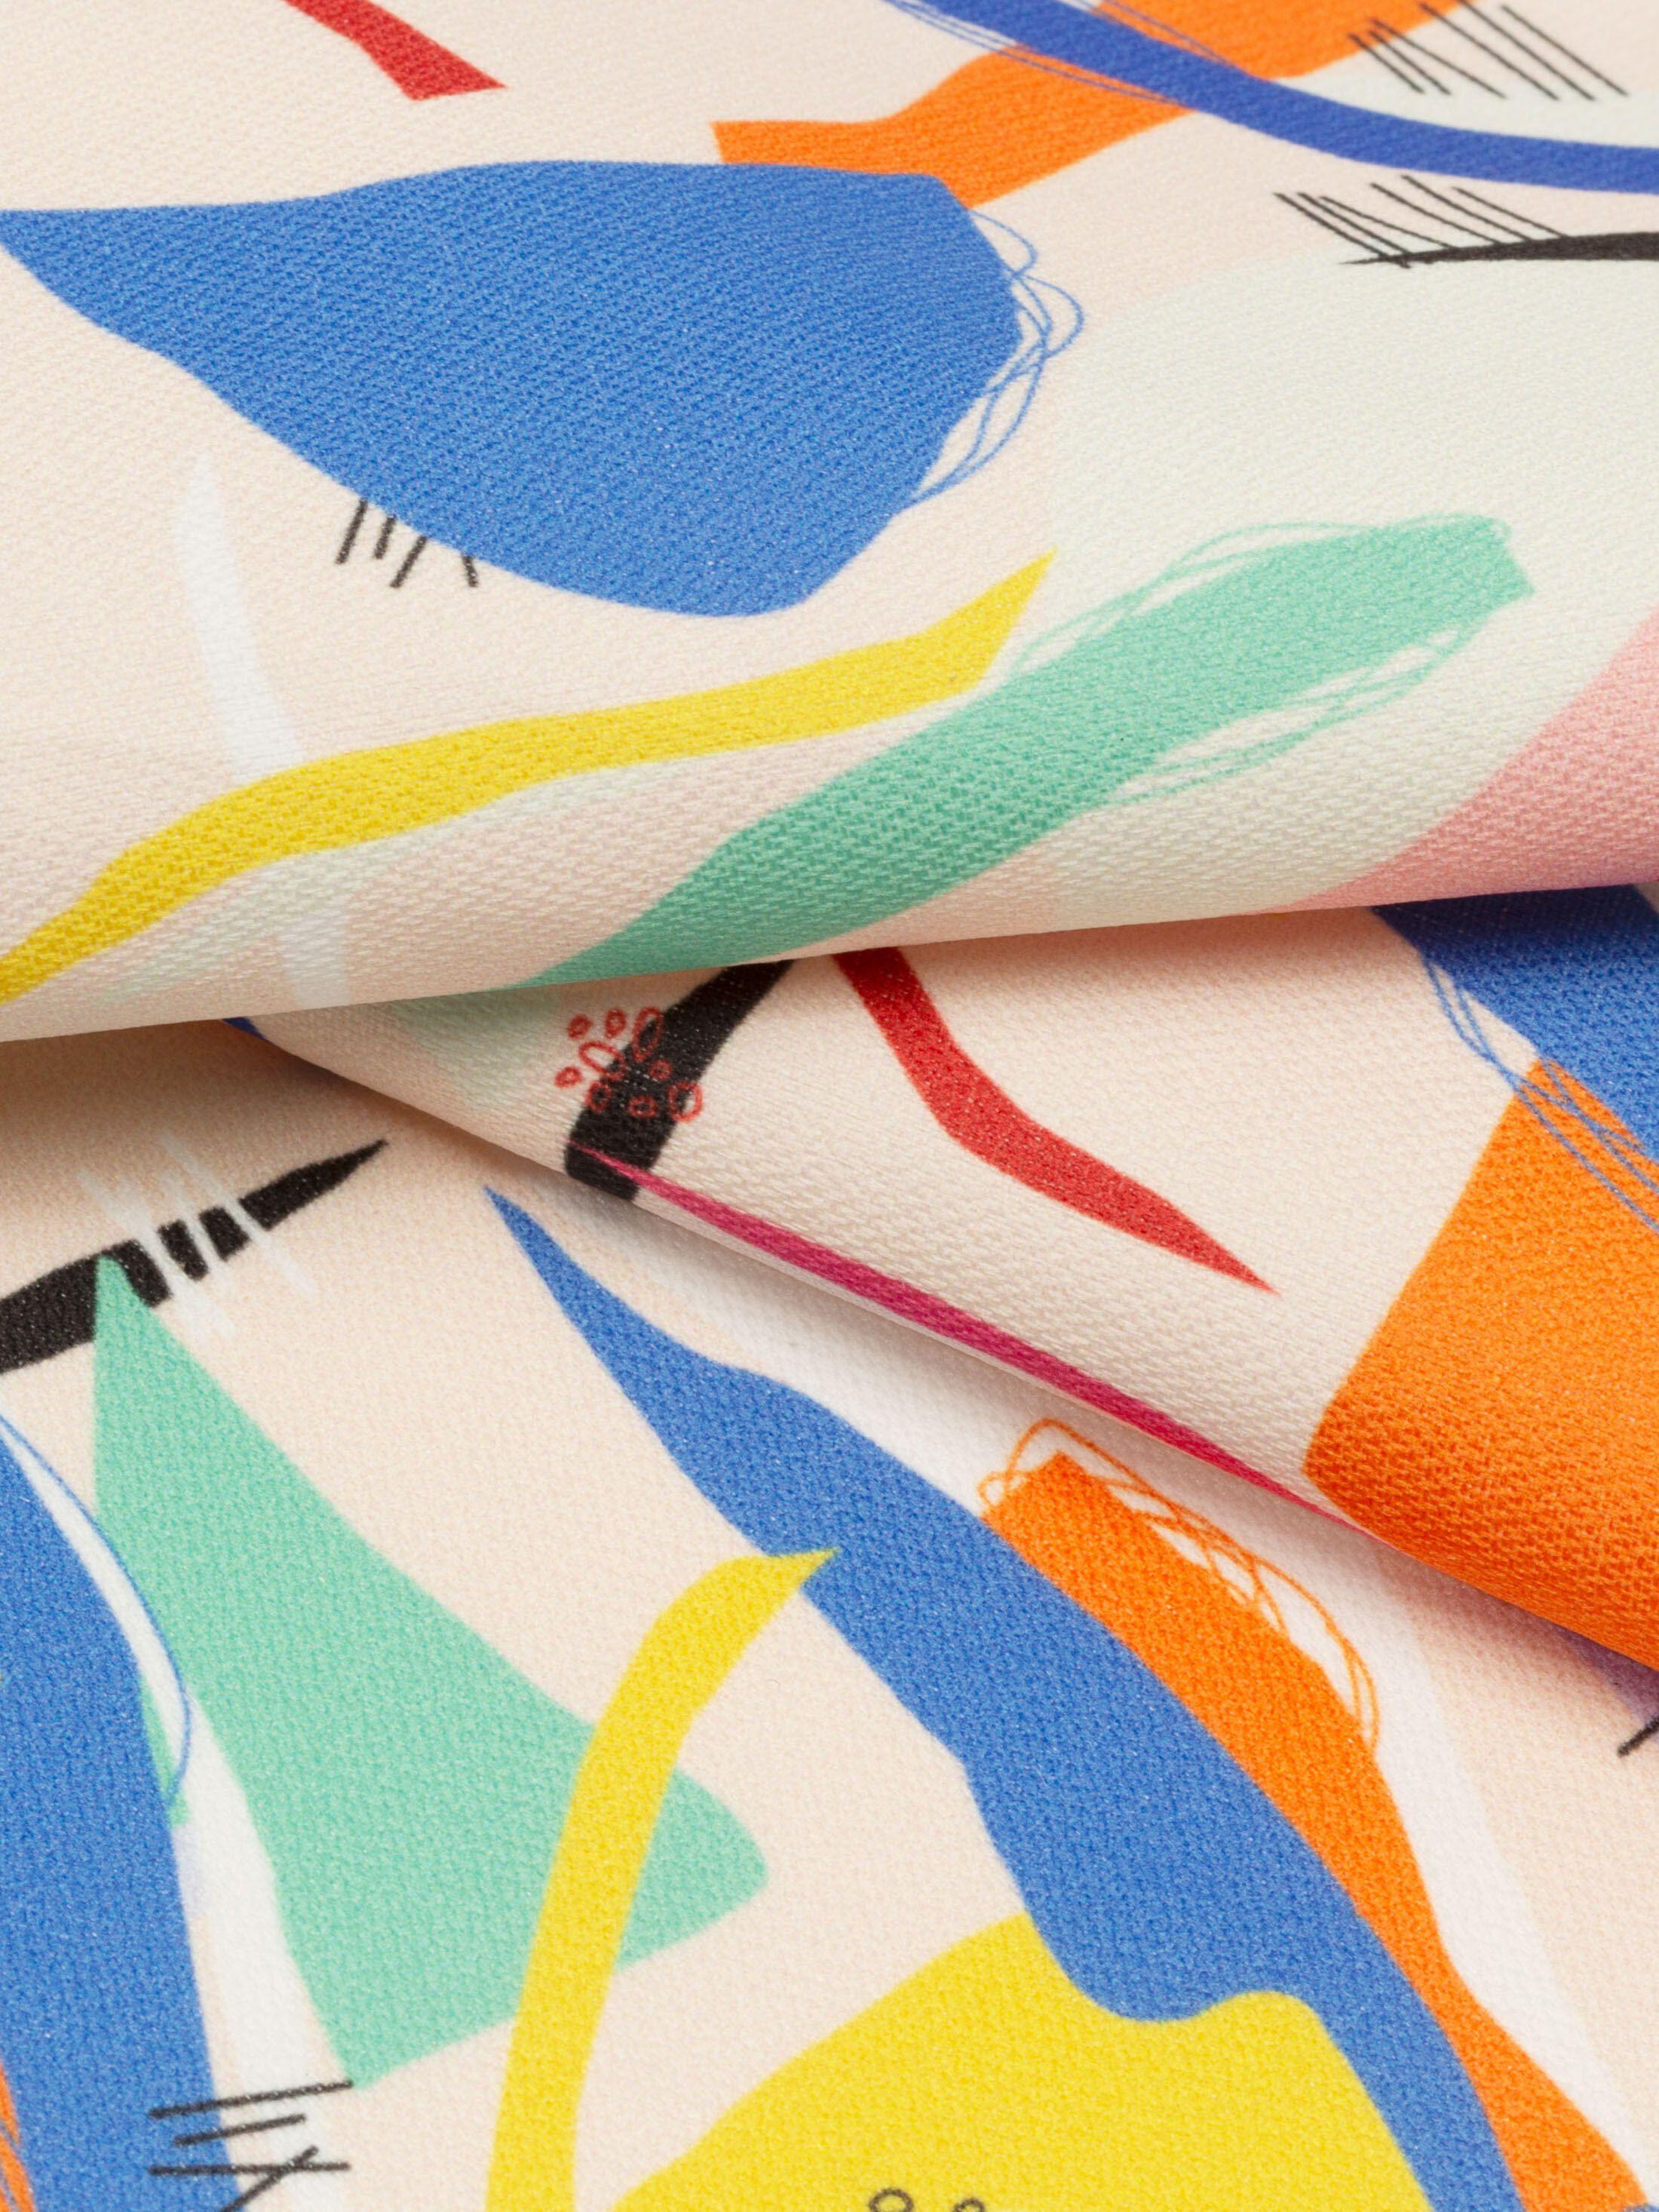 Lima Cotton Twill digital print fabric